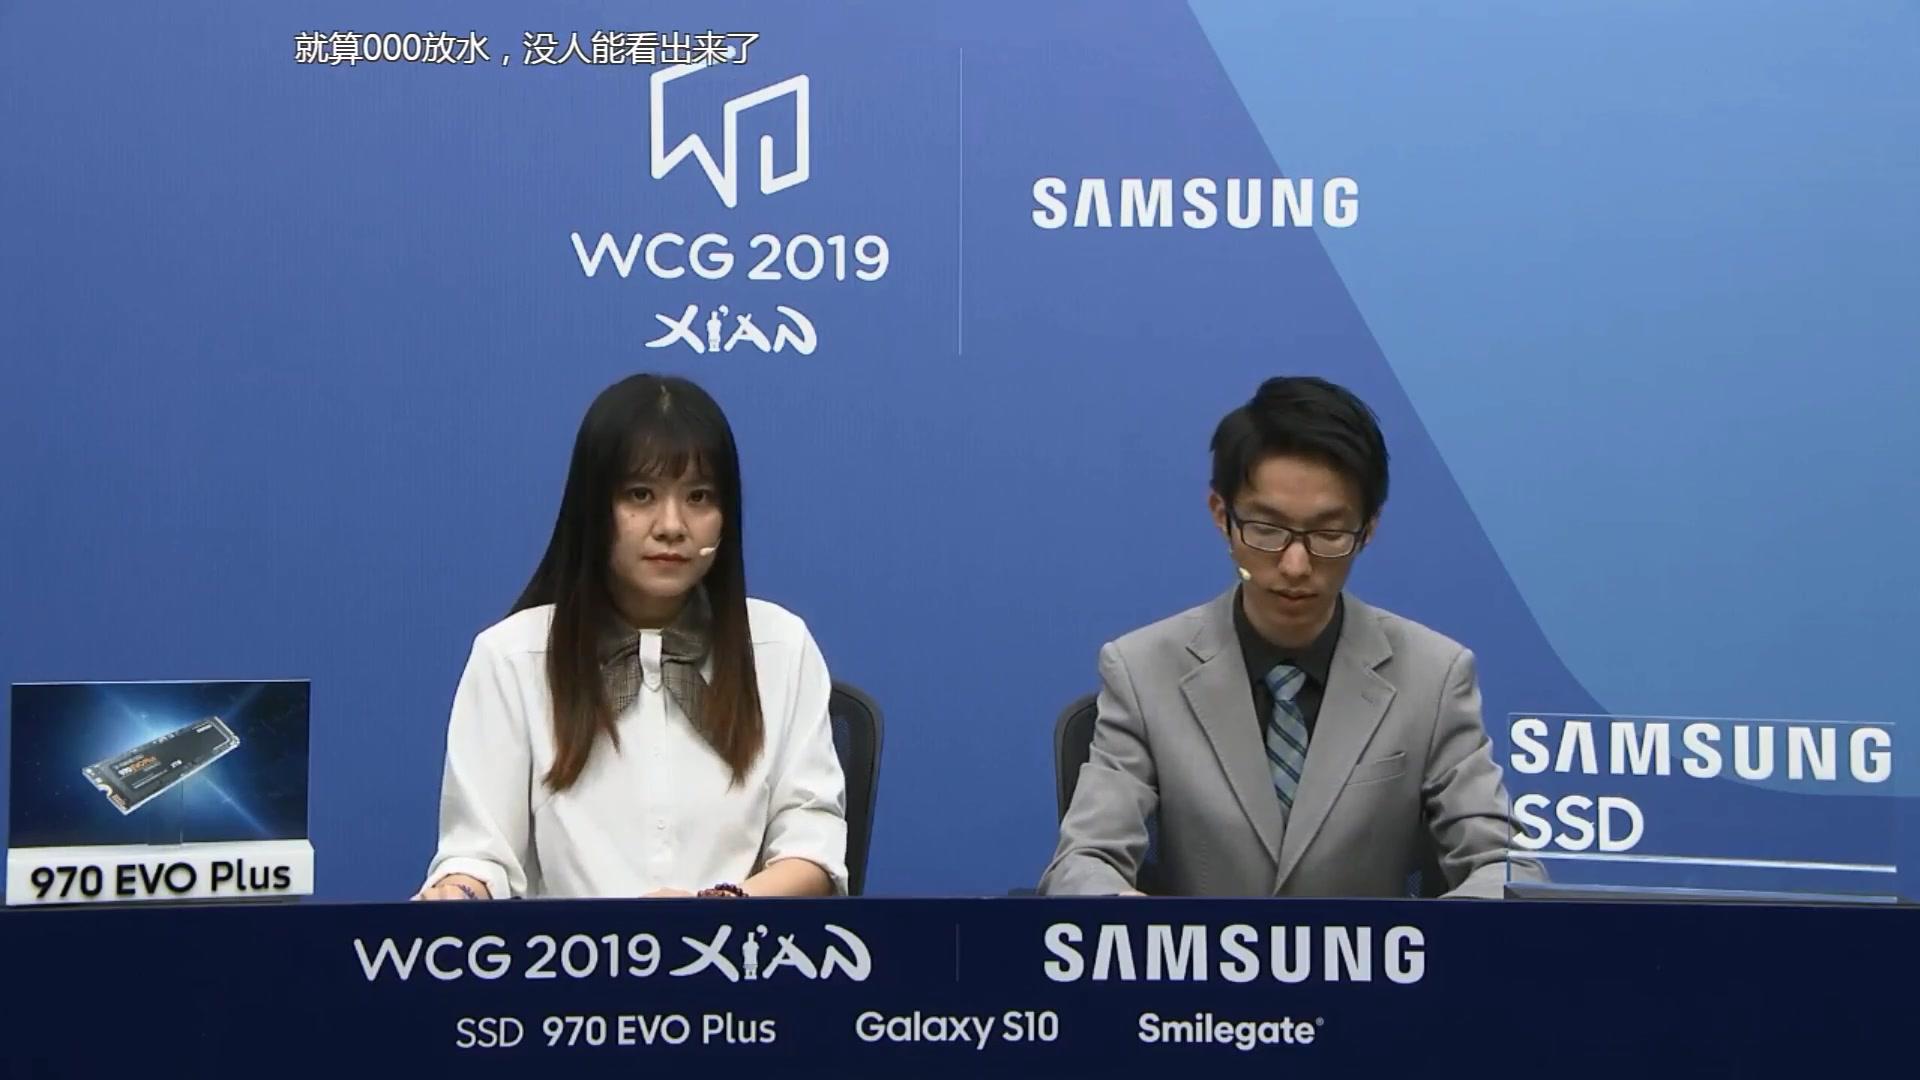 WCG 2019 魔兽争霸 TH000 VS INFI TH000_哔哩哔哩 (゜-゜)つロ 干杯~-bilibili